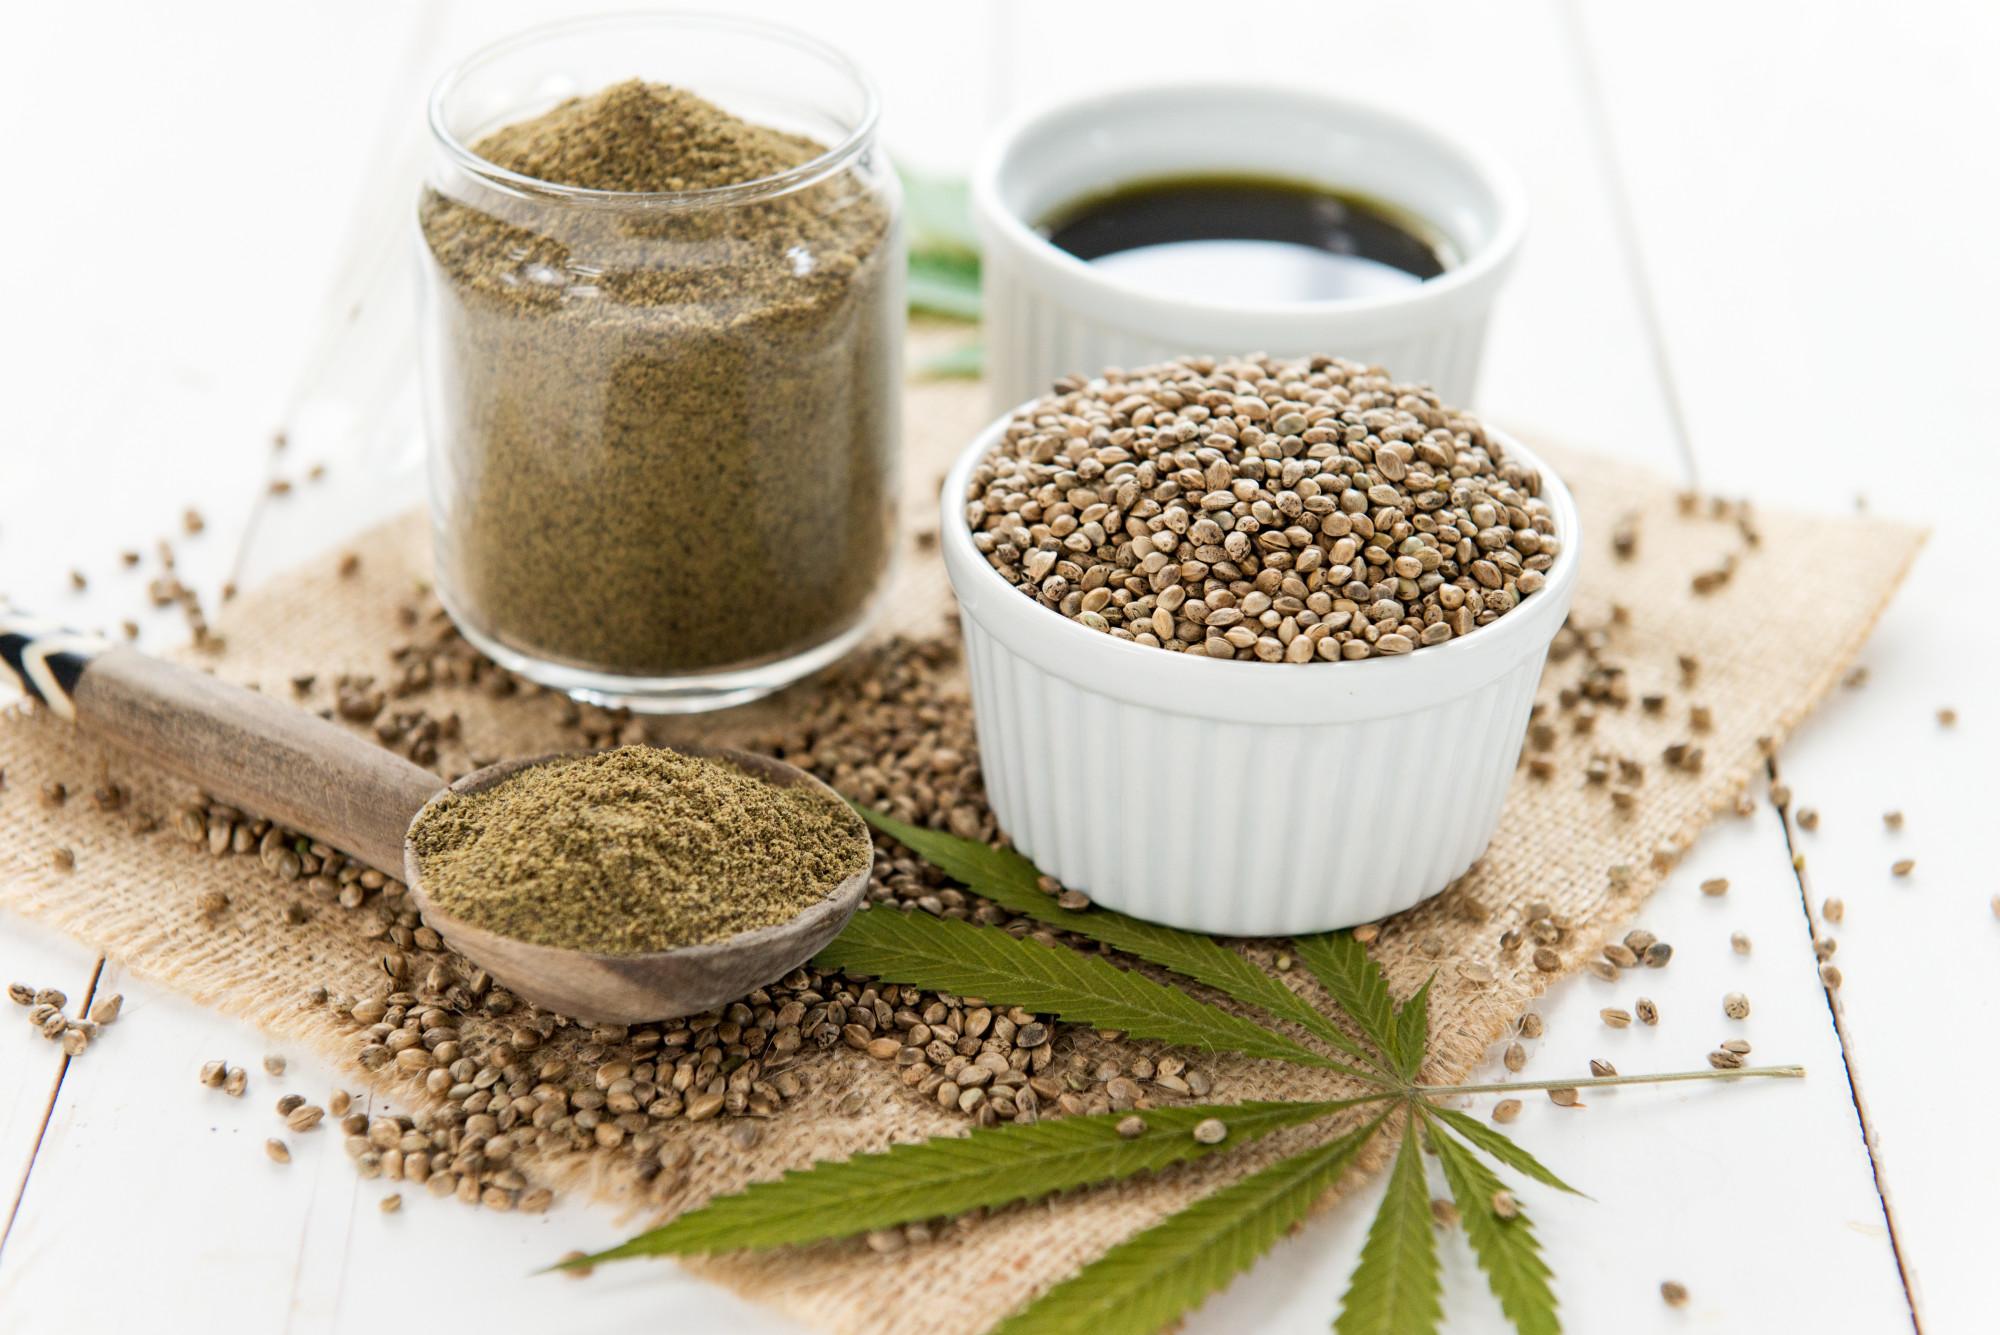 cbd oil, seeds and powder